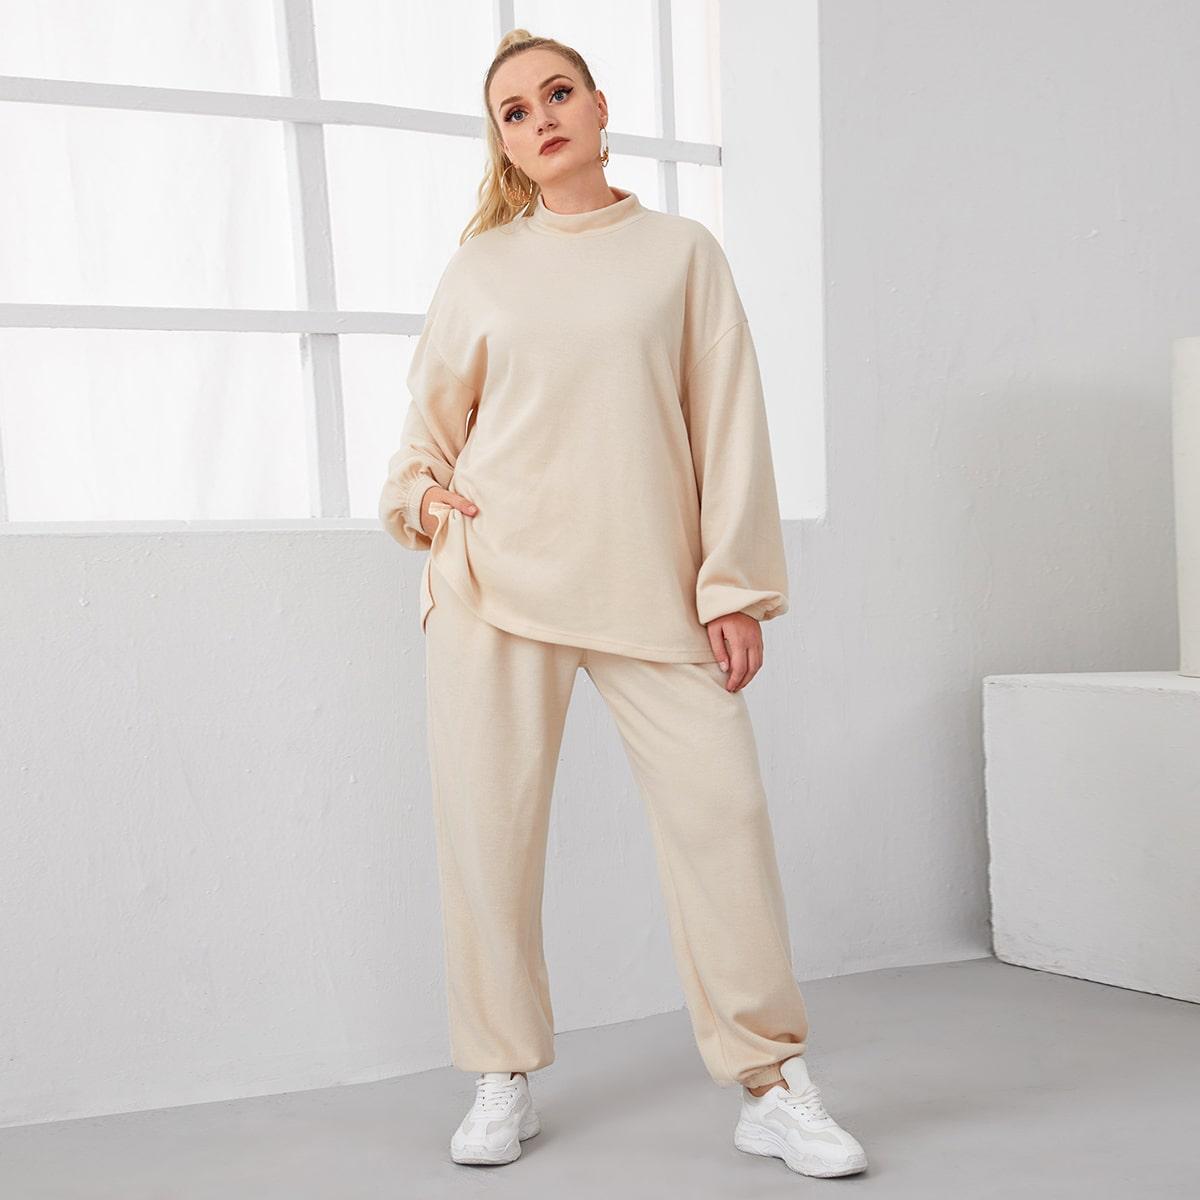 Plus Mock-Neck Split Dip Hem Top & Pants Set, SHEIN  - buy with discount